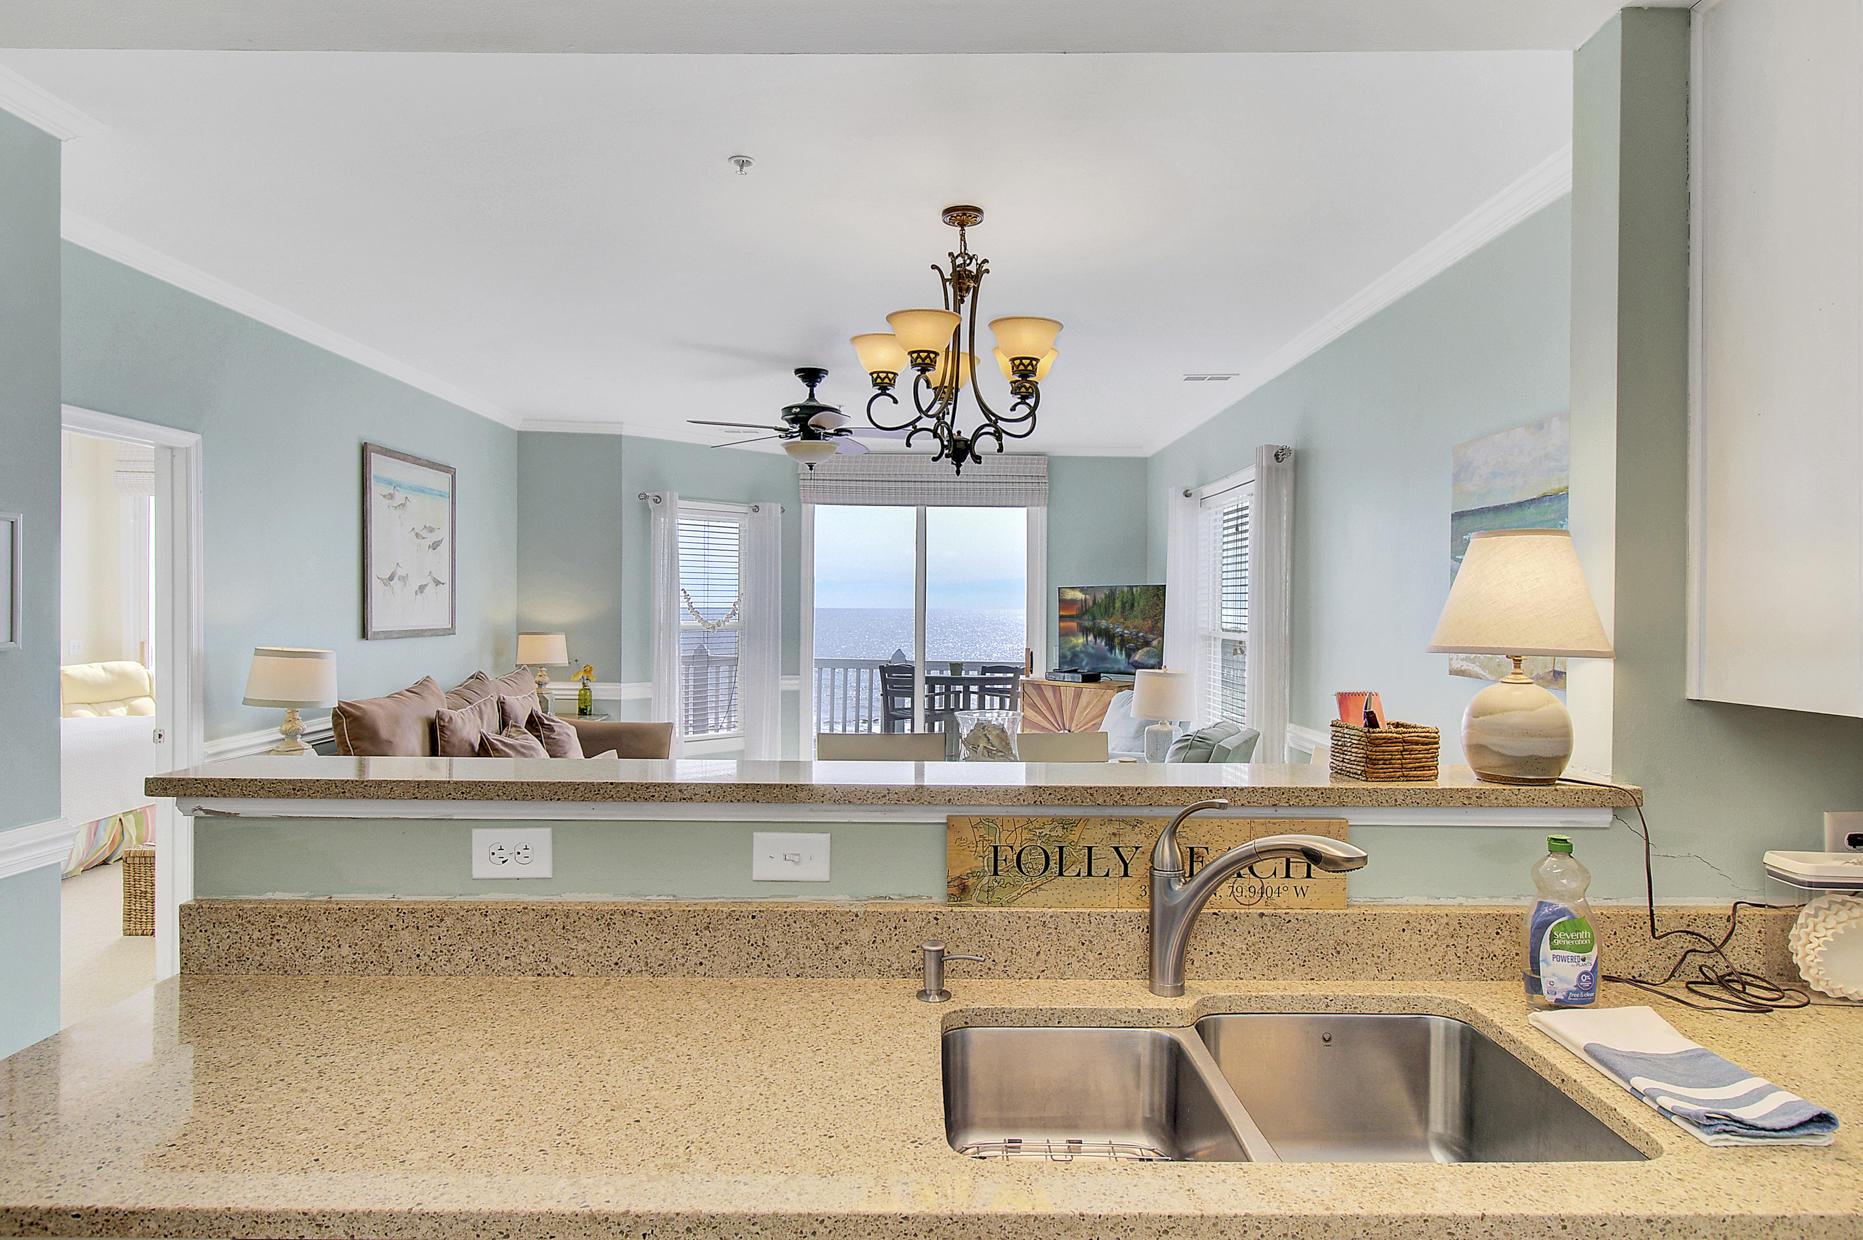 Seaside Villas I Homes For Sale - 111 Arctic, Folly Beach, SC - 7